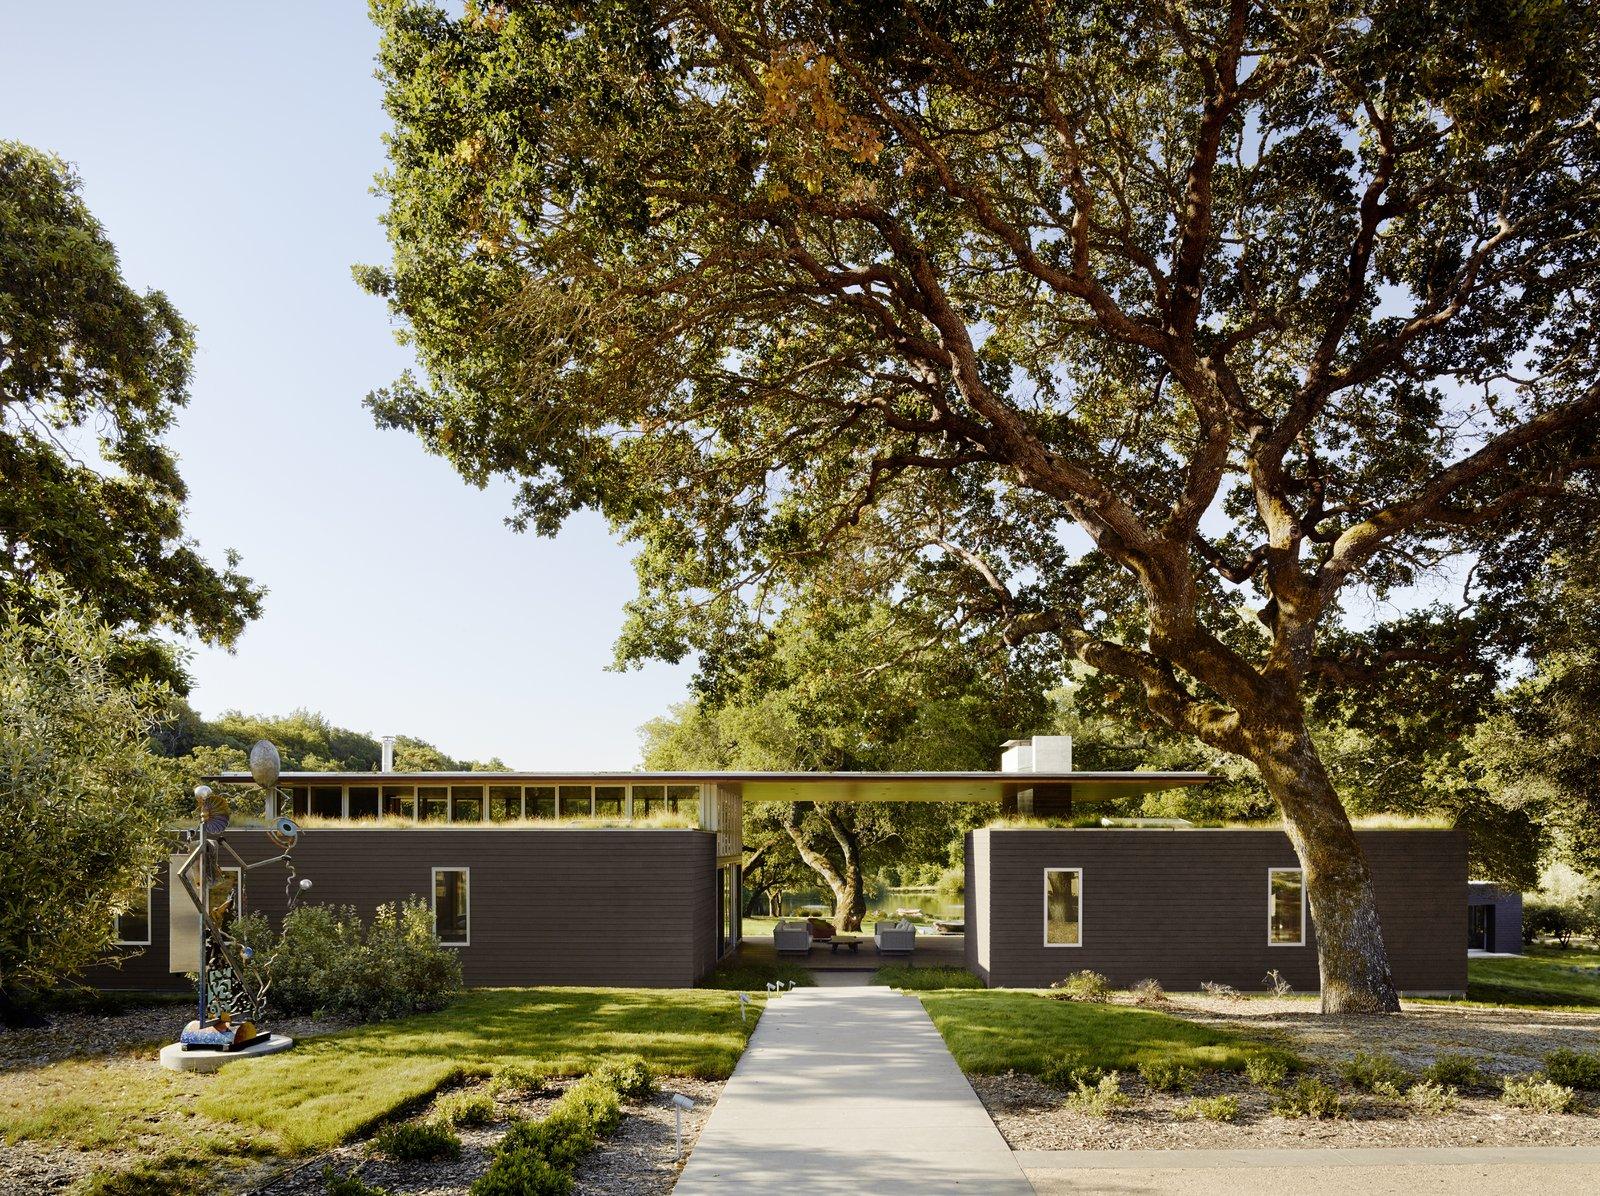 #TurnbullGriffinHaesloop #outdoor #exterior #landscape #livingroof  Sonoma Residence by Turnbull Griffin Haesloop Architects